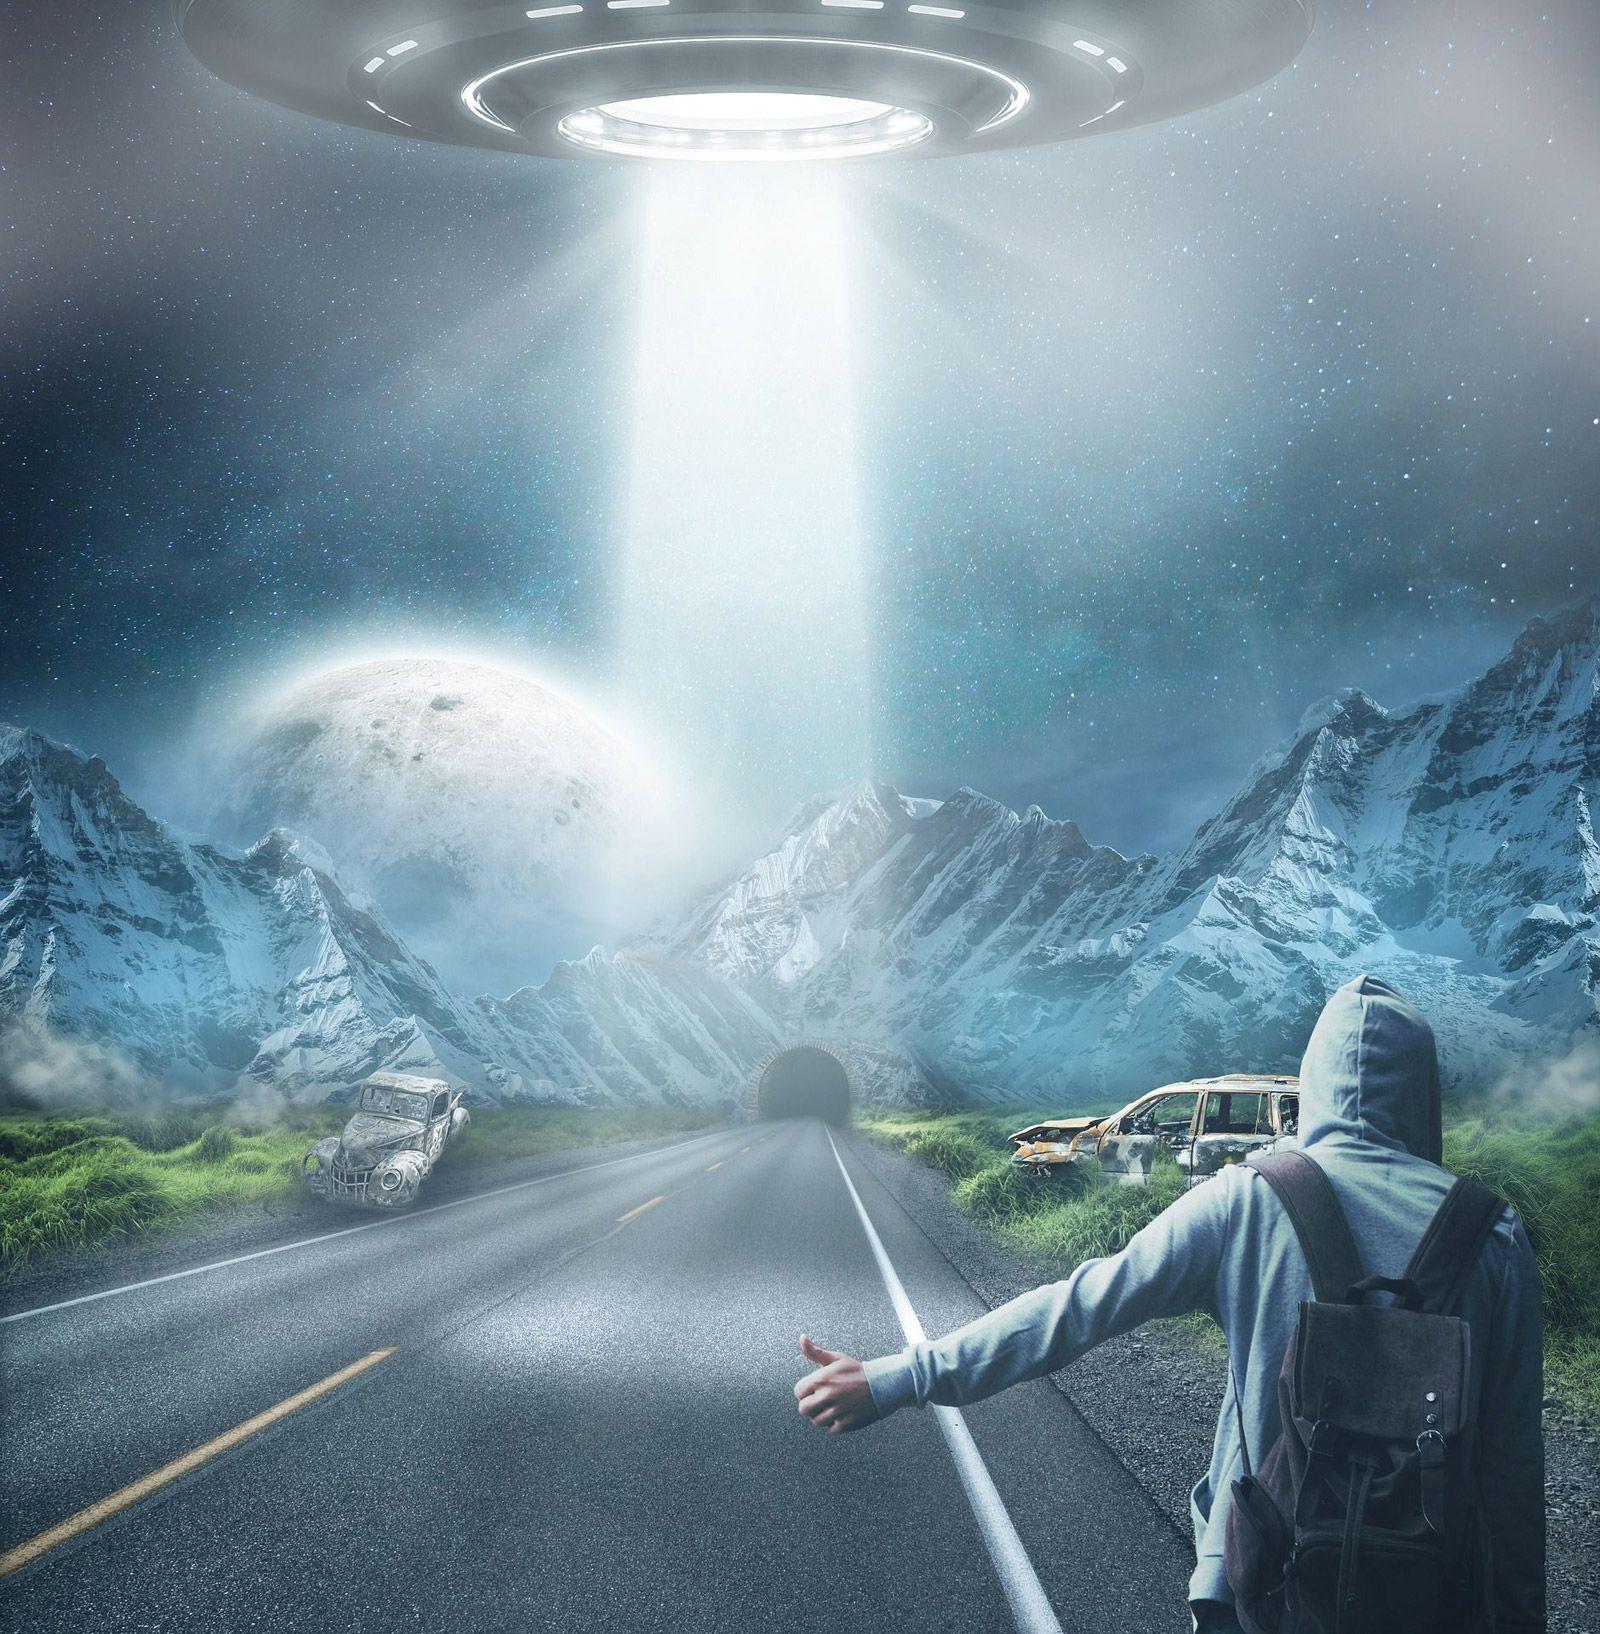 ufo photo rejoice light